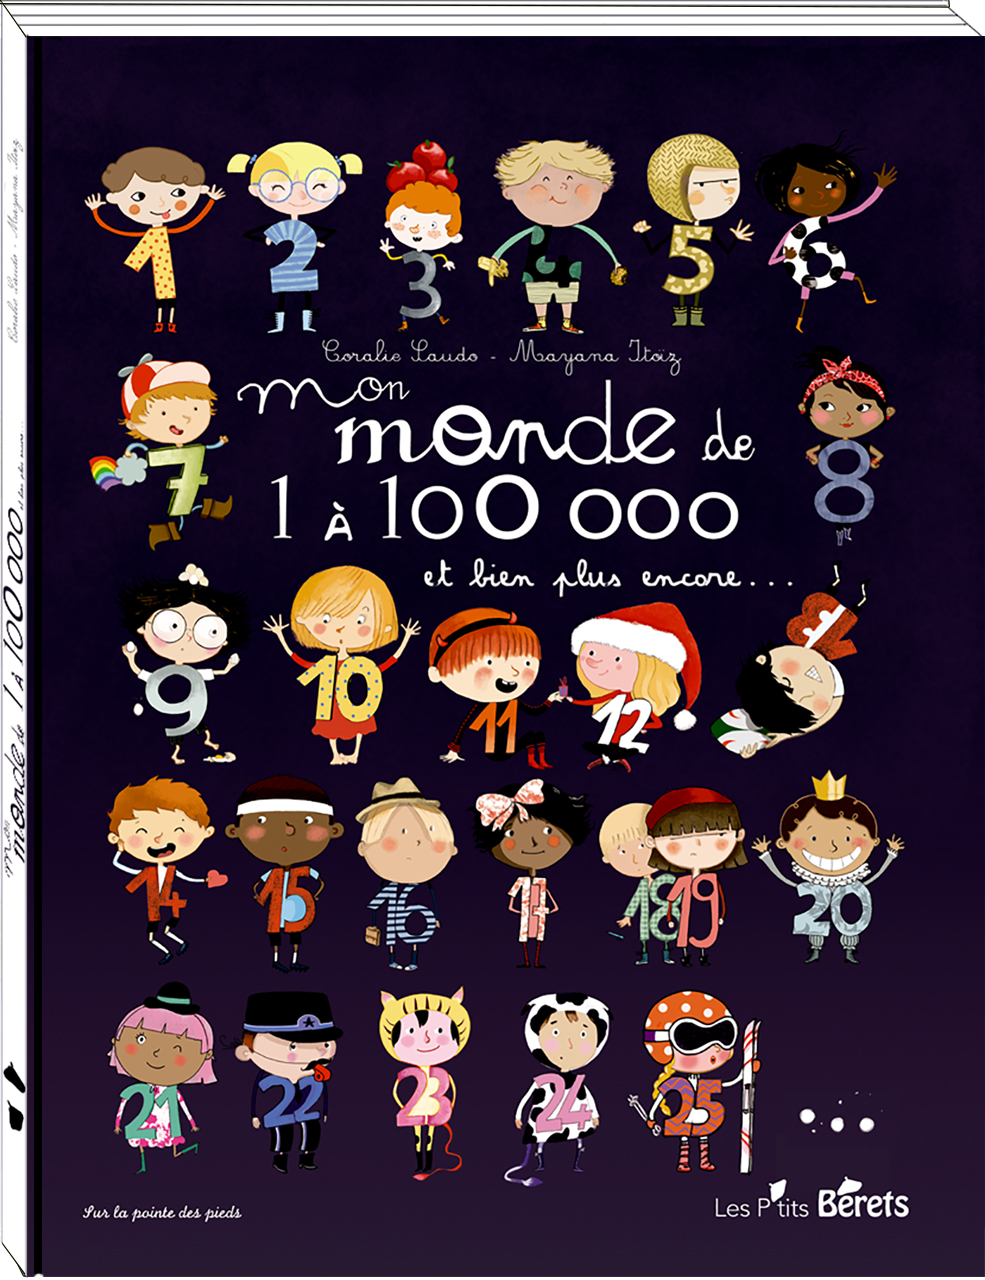 mayana-itoiz-illustratrice-mon-monde-de1-a-1000-couverture